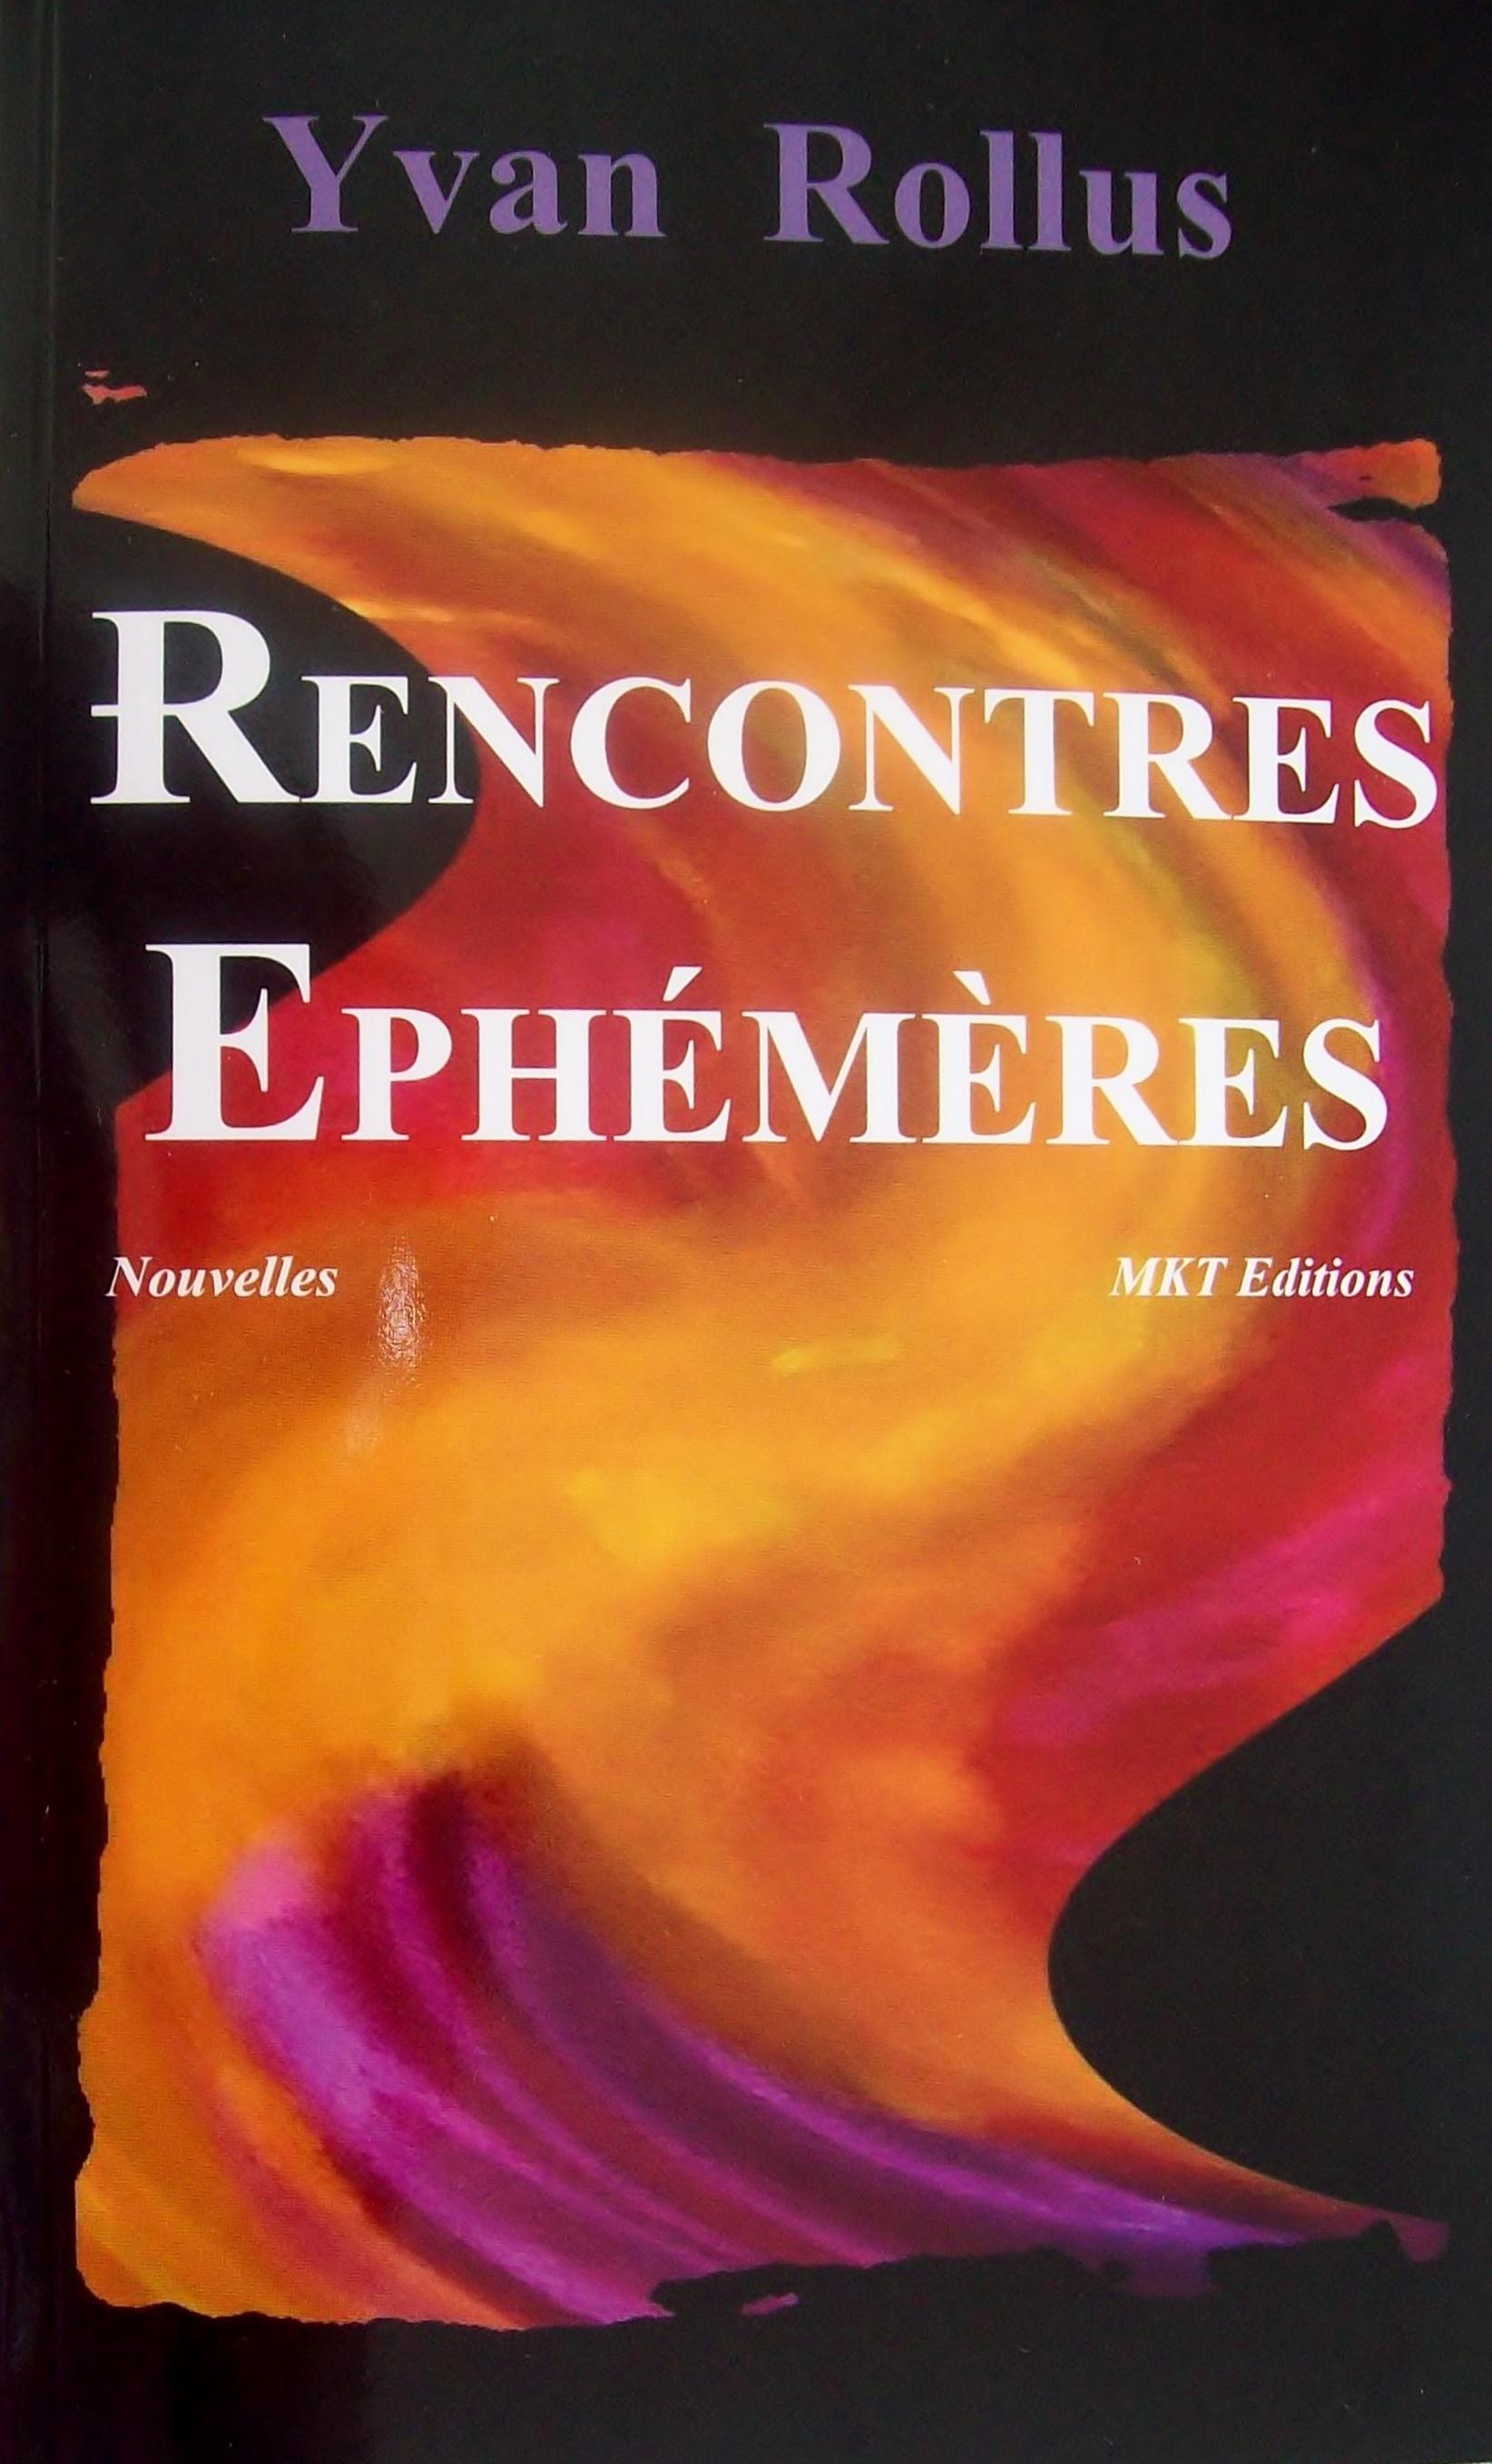 RENCONTRES EPHEMERES